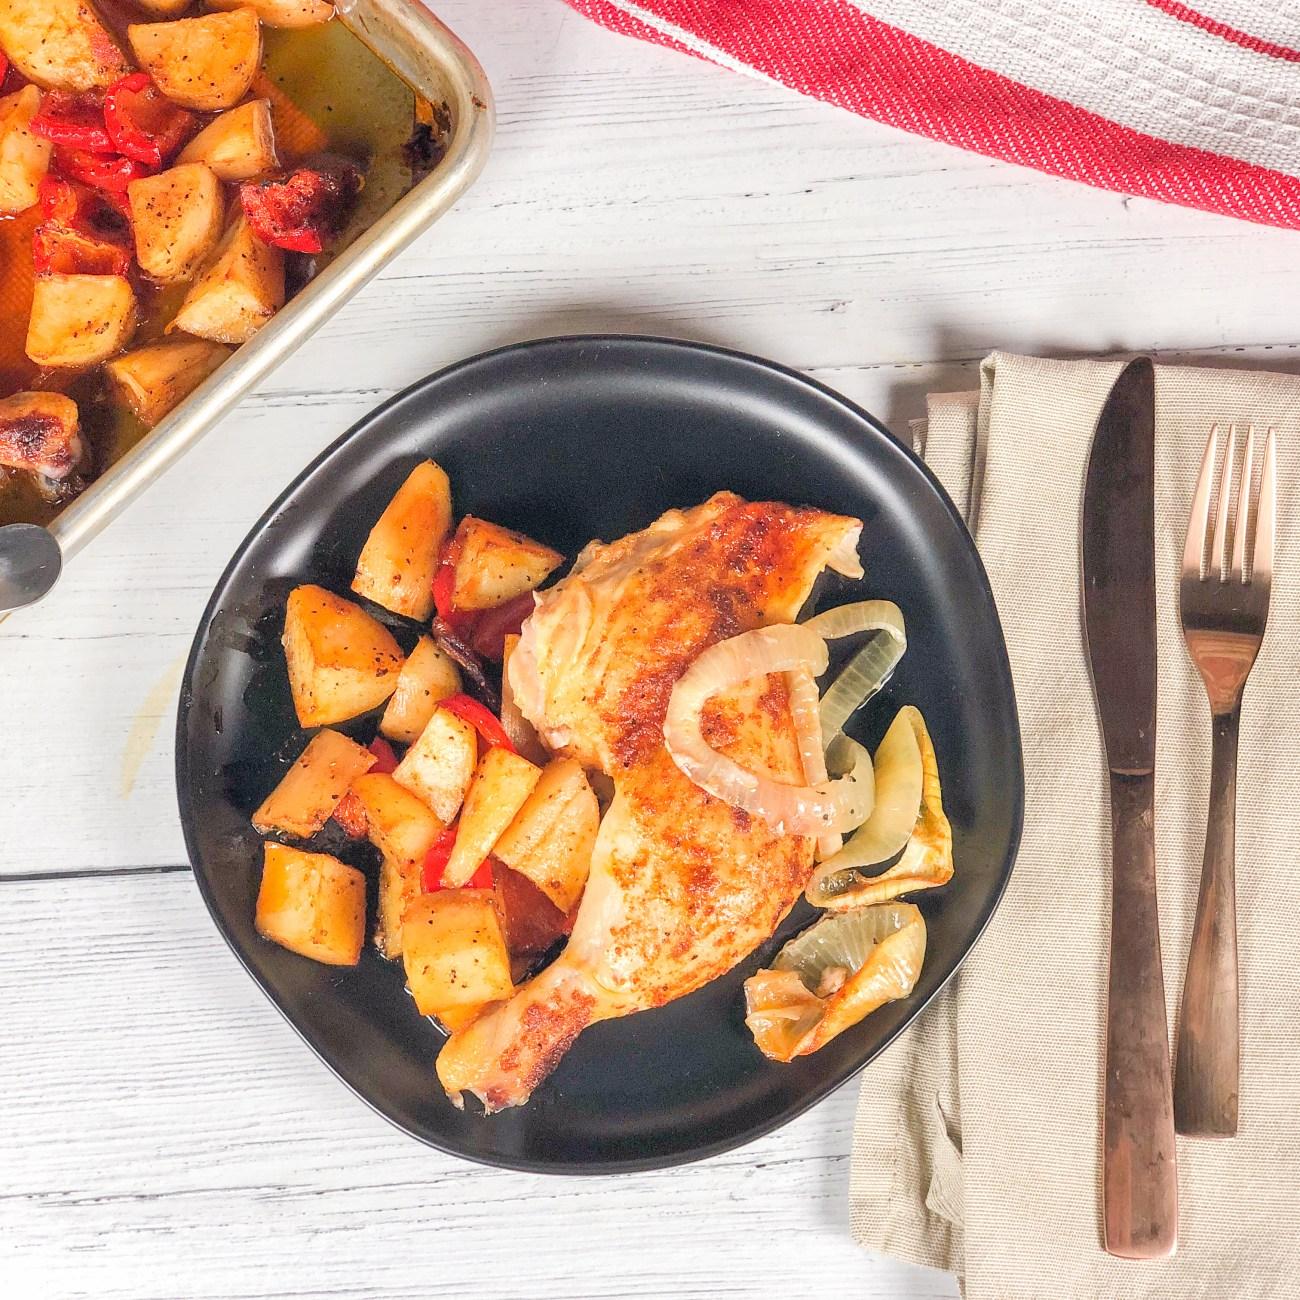 Sheetpan Spatchcock Chicken Dinner